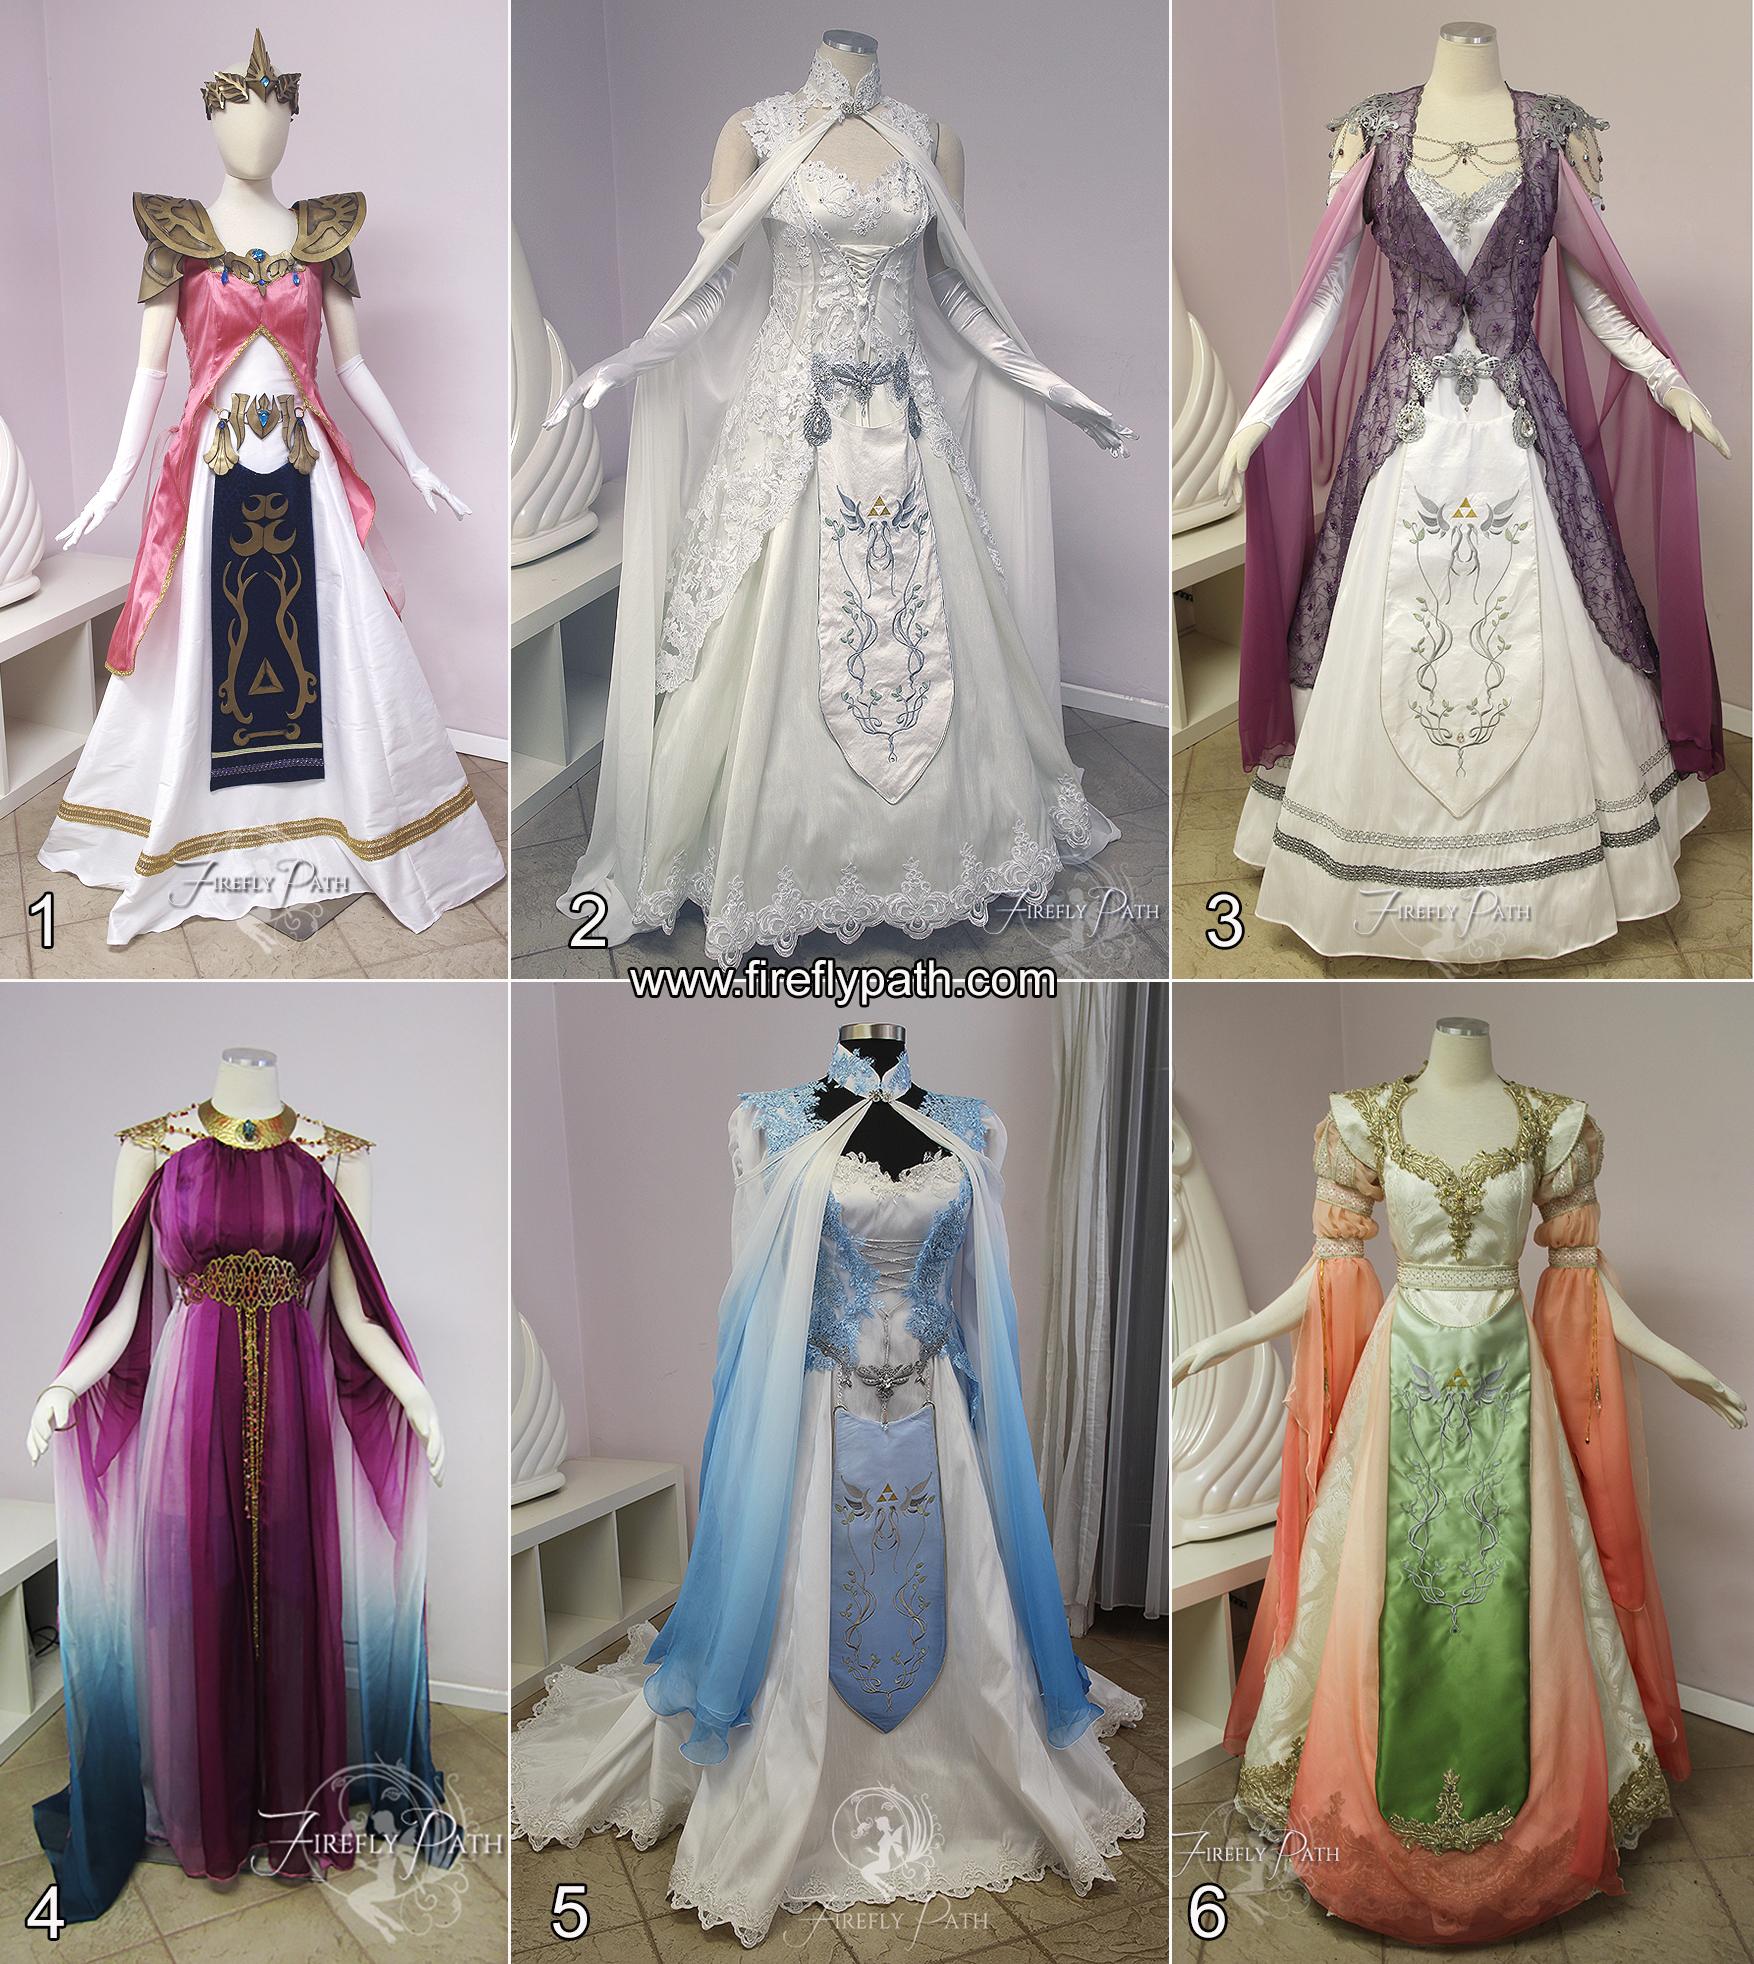 Princess Zelda Fashion By Firefly-Path On DeviantArt